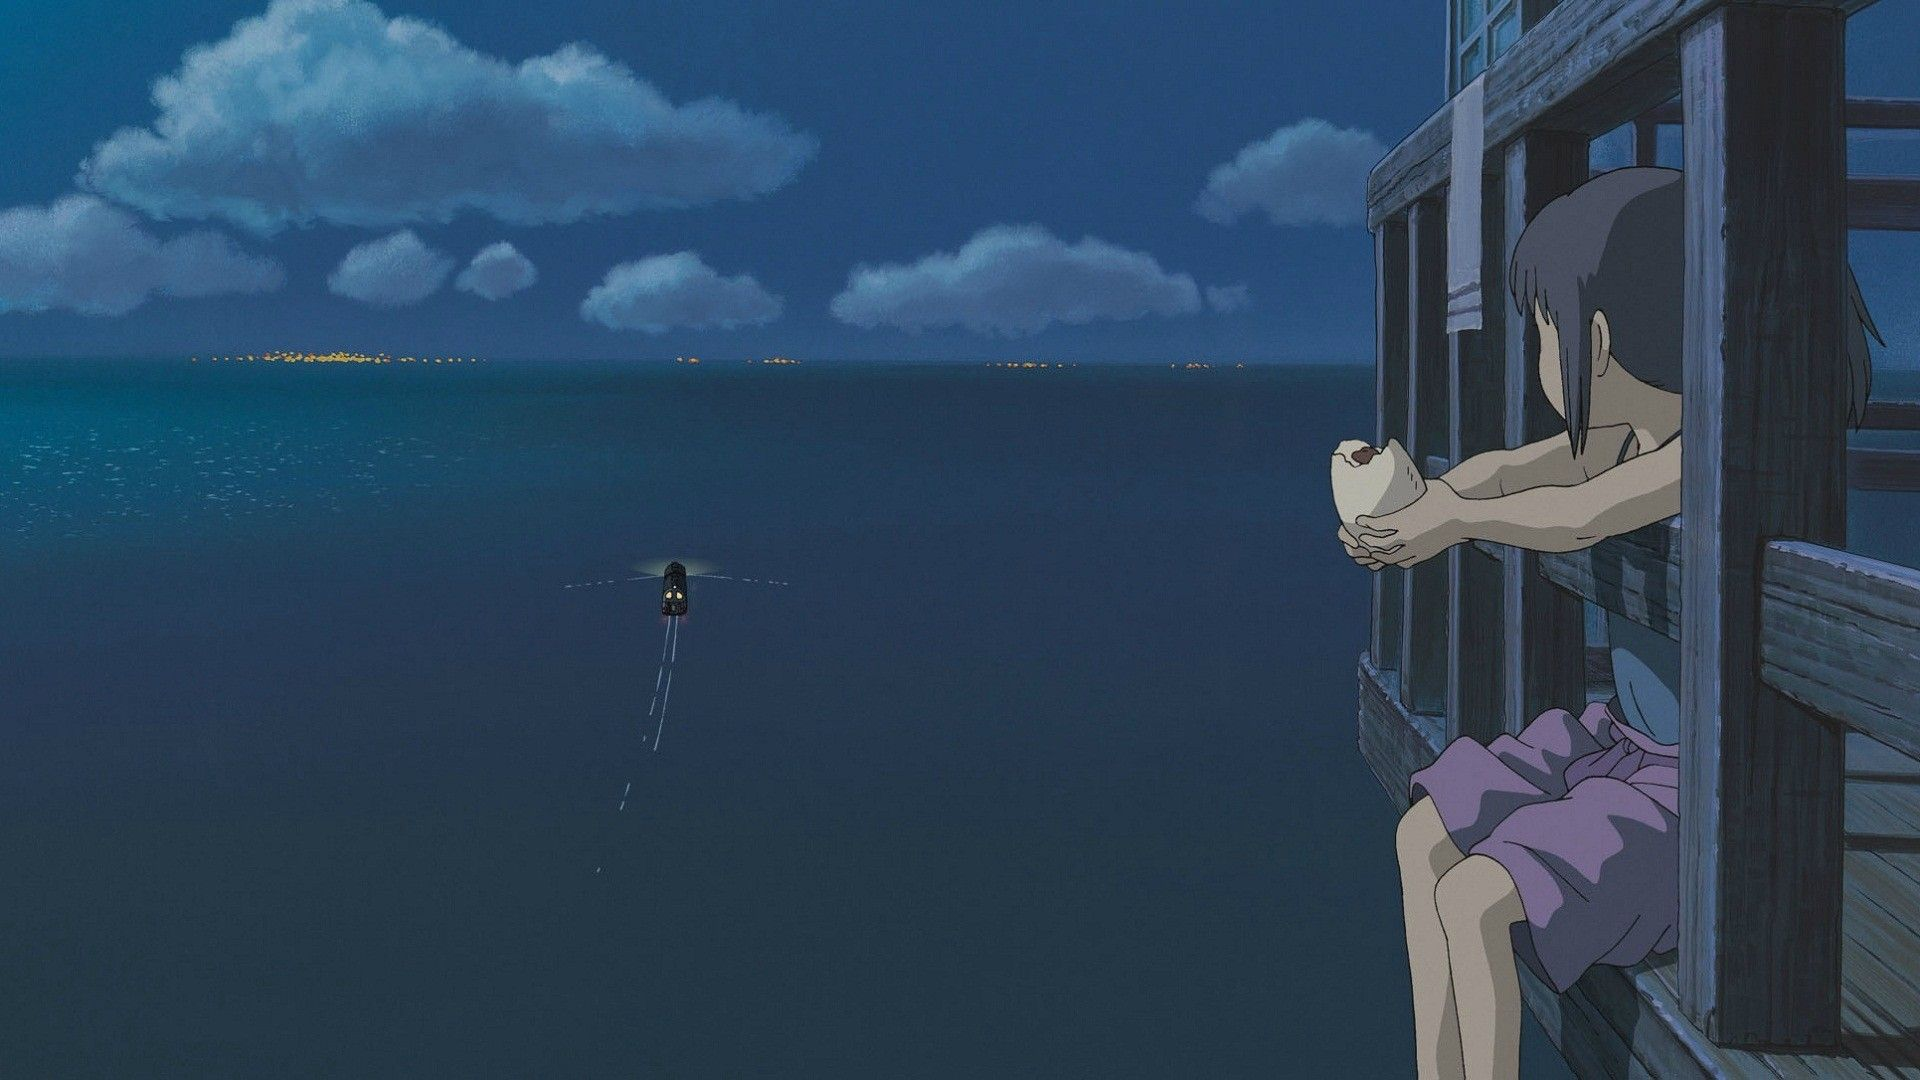 Destroying Wallpaper Dump. 12,000 images Ghibli